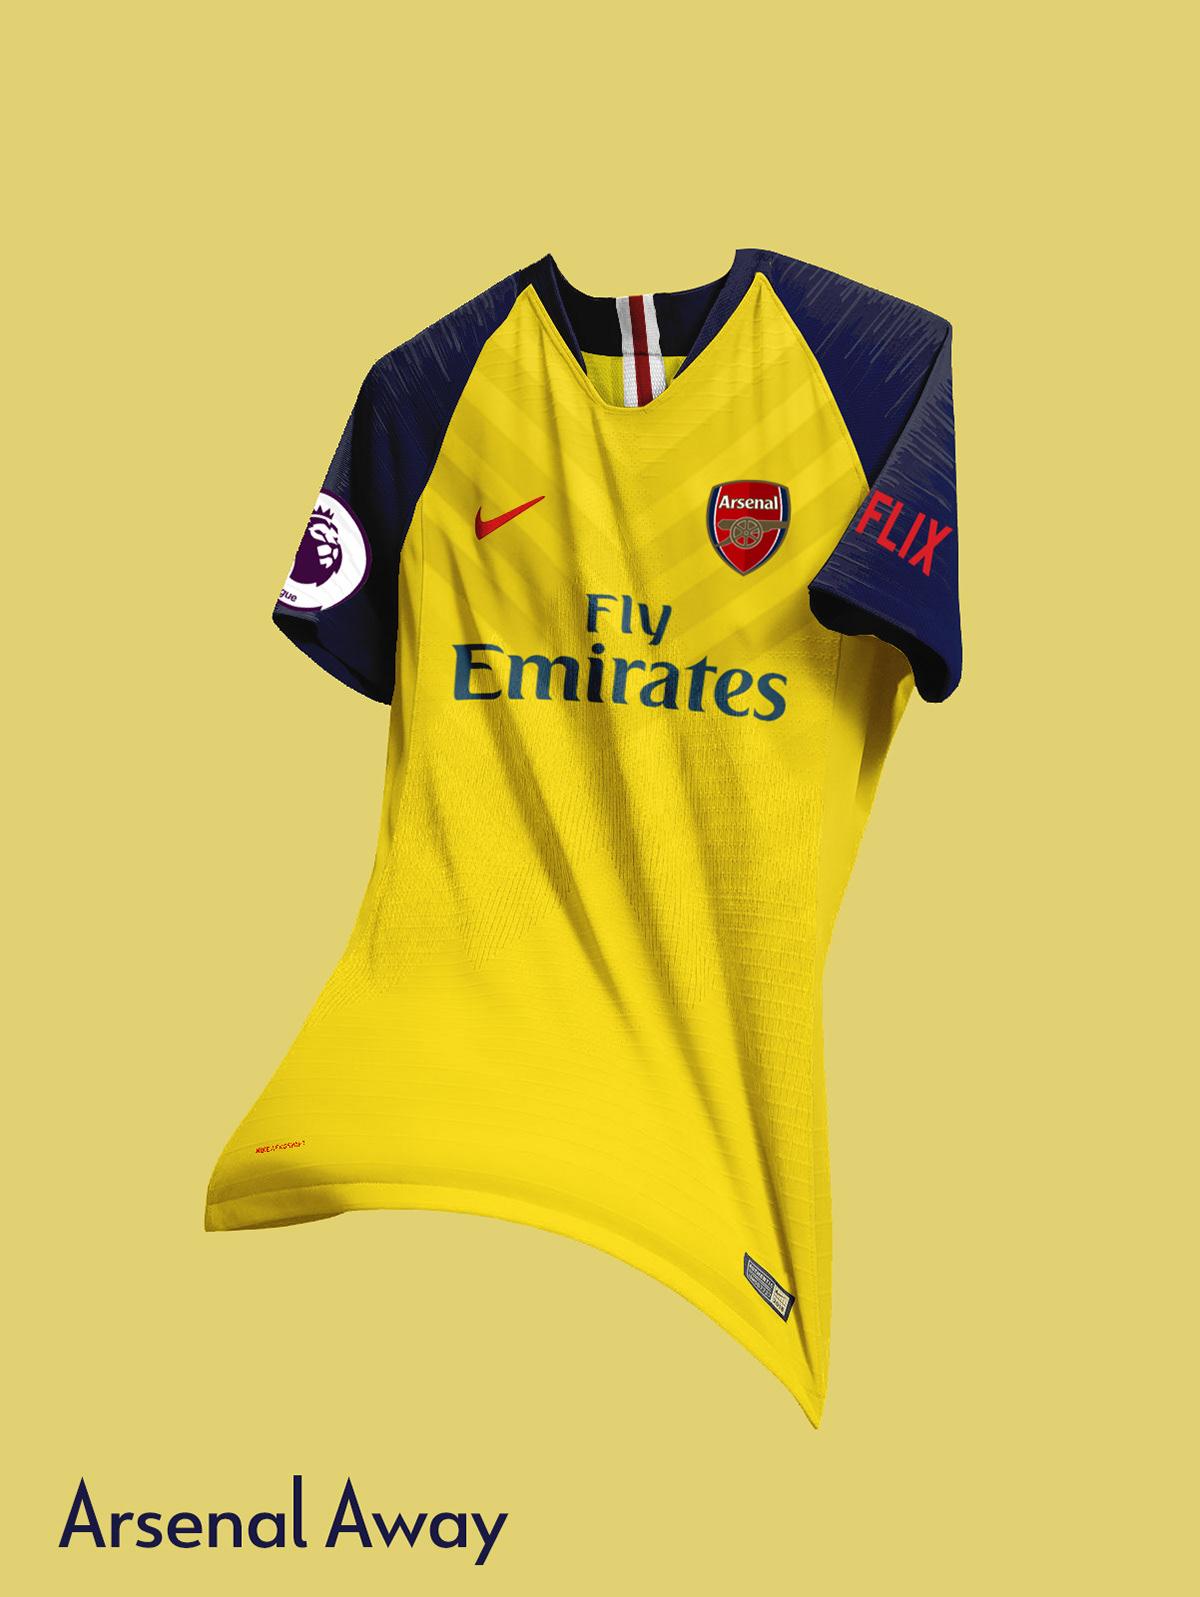 promo code 1de19 3378f Arsenal FC Nike Concept Kits | 2019-2020 on Behance